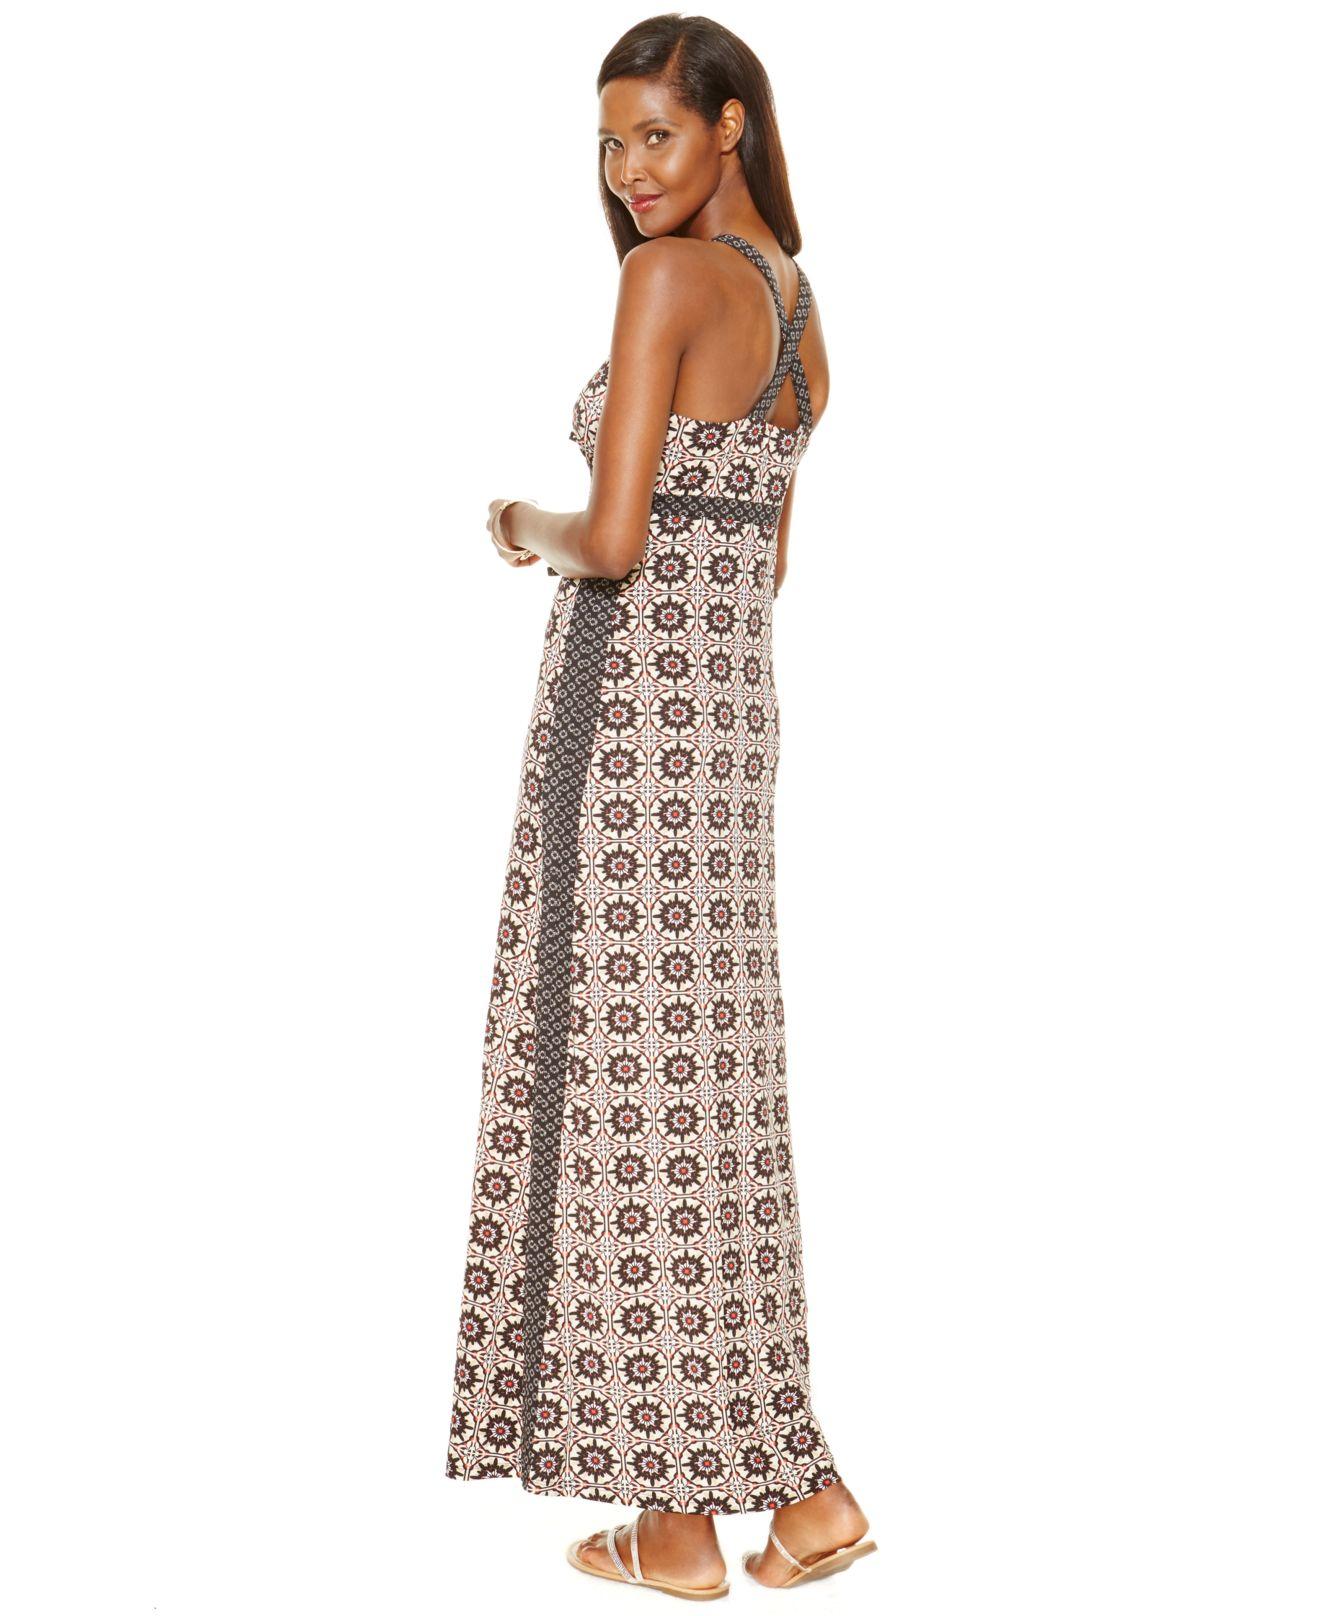 38abc0e0d4c Lyst - INC International Concepts Printed Cross-back Maxi Dress in ...